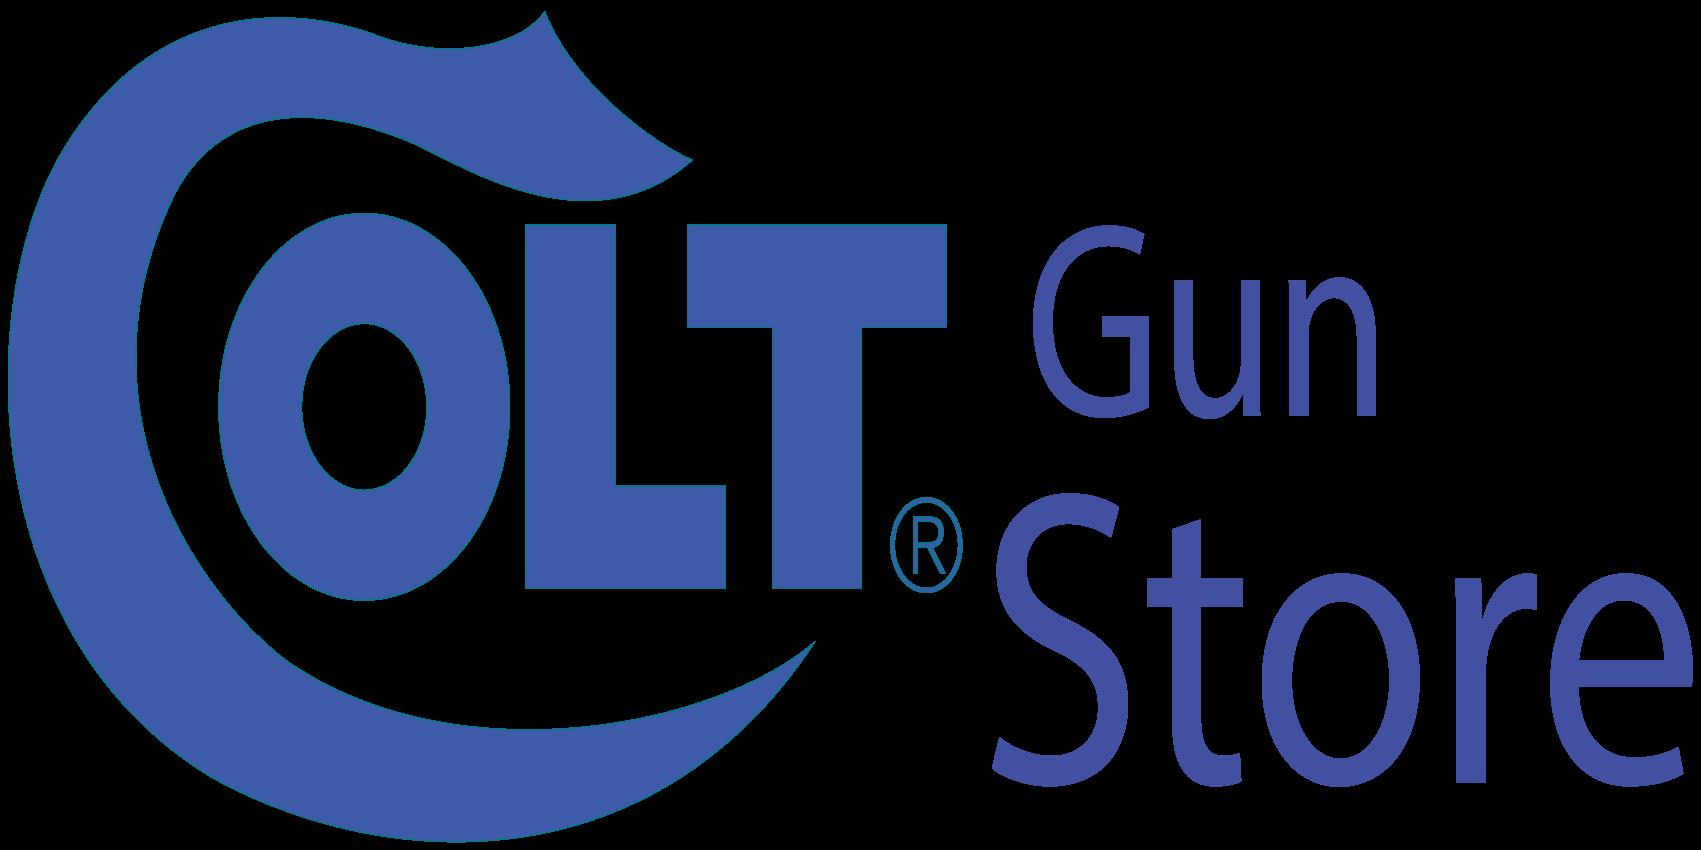 Colt Gun Store